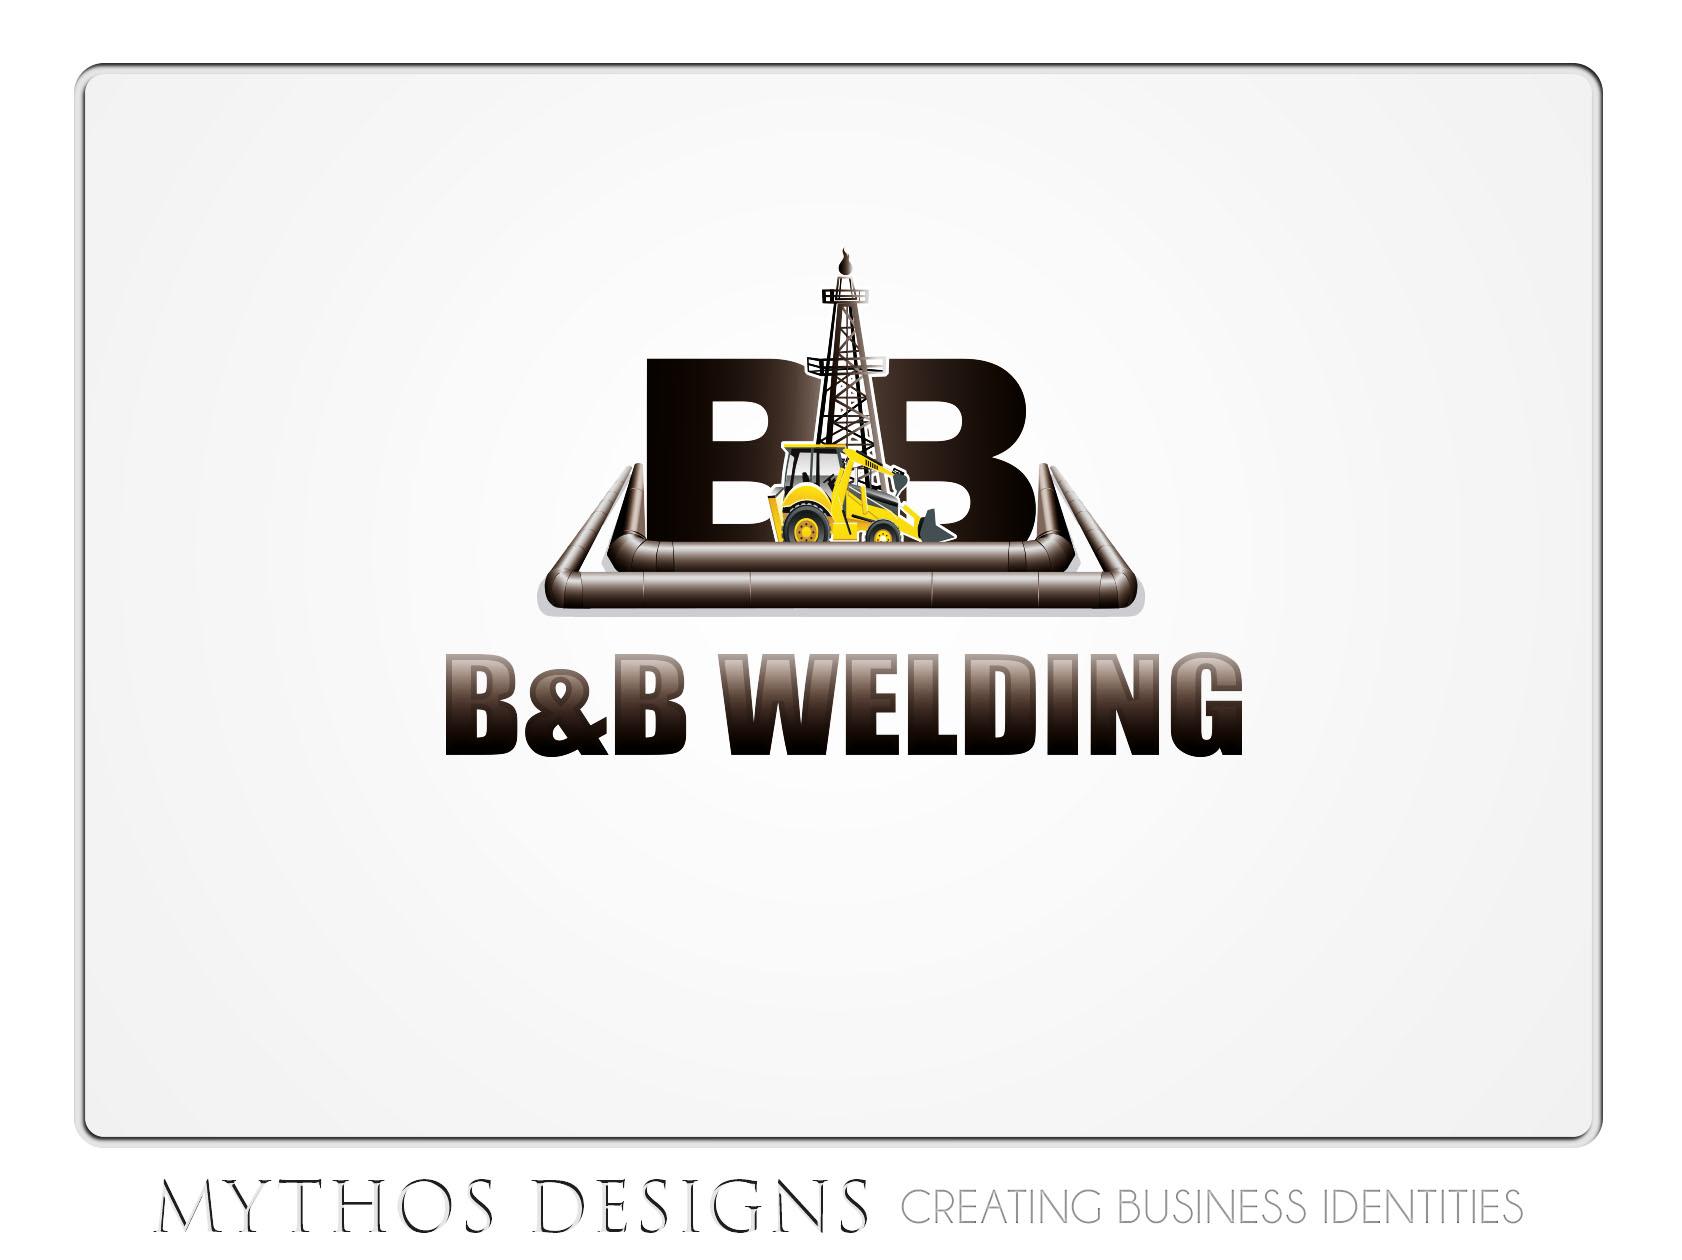 Logo Design by OmegaDesigns - Entry No. 60 in the Logo Design Contest Fun Logo Design for B&B Welding Inc..